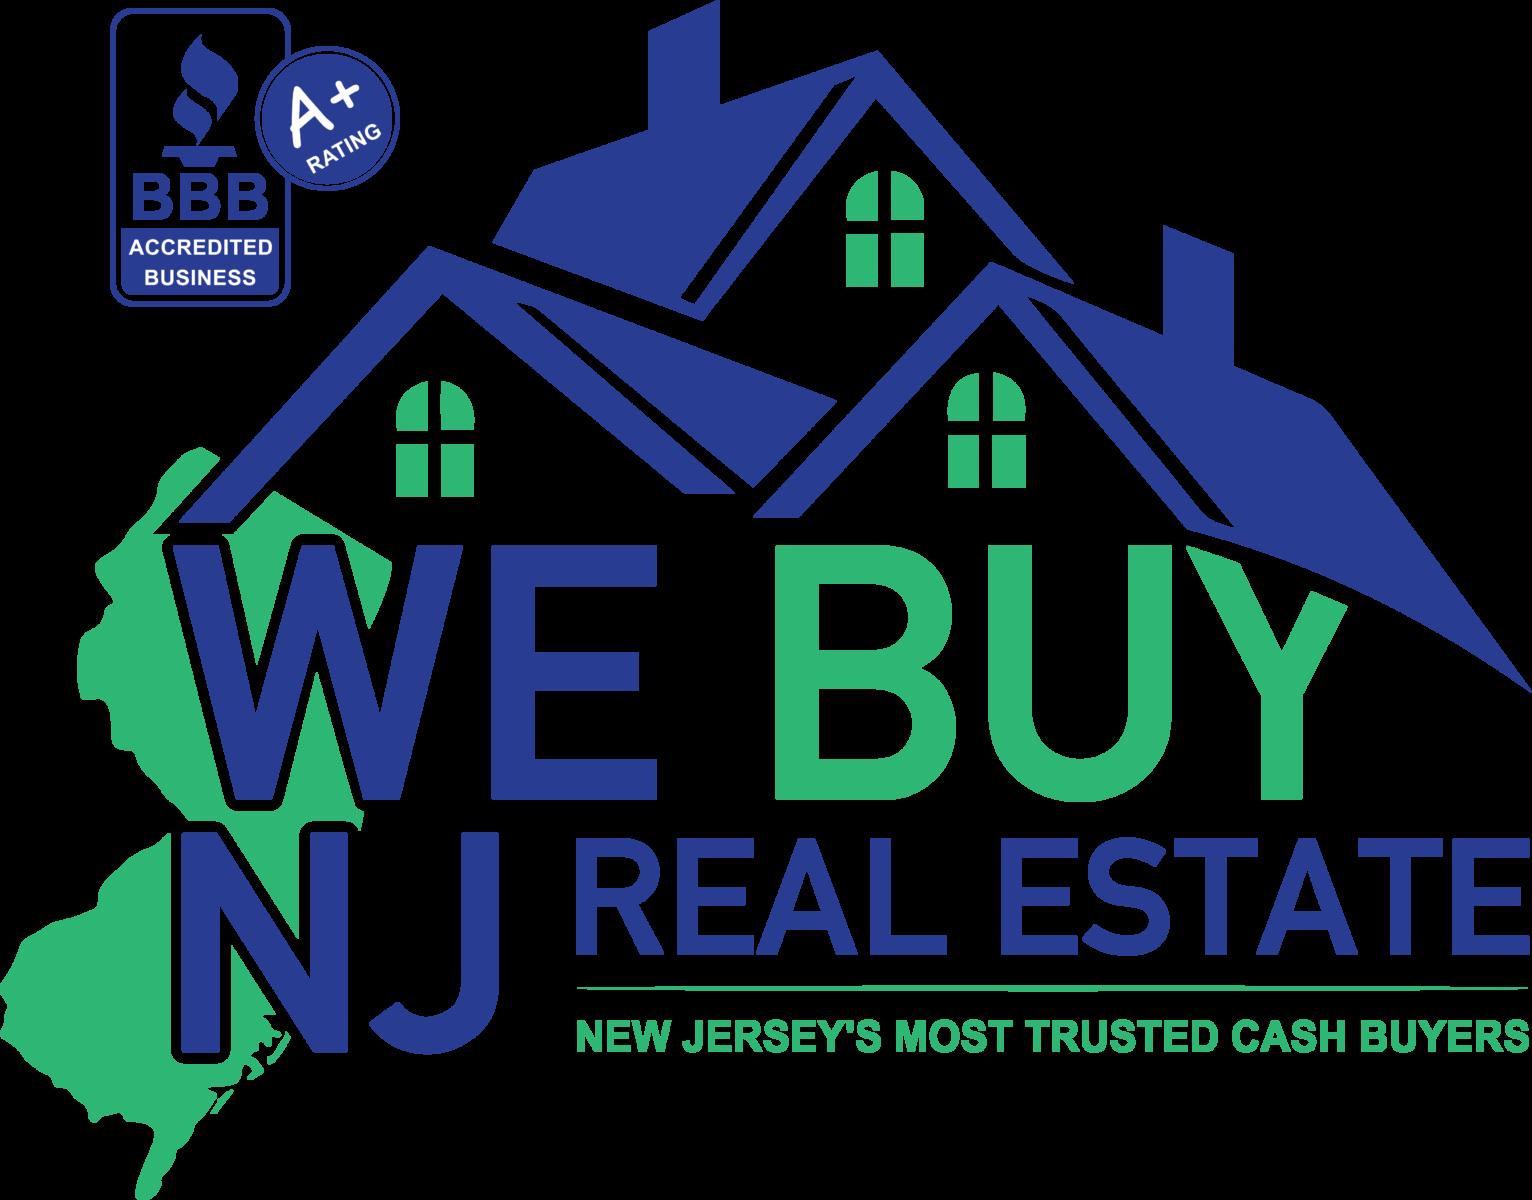 We Buy NJ Real Estate logo